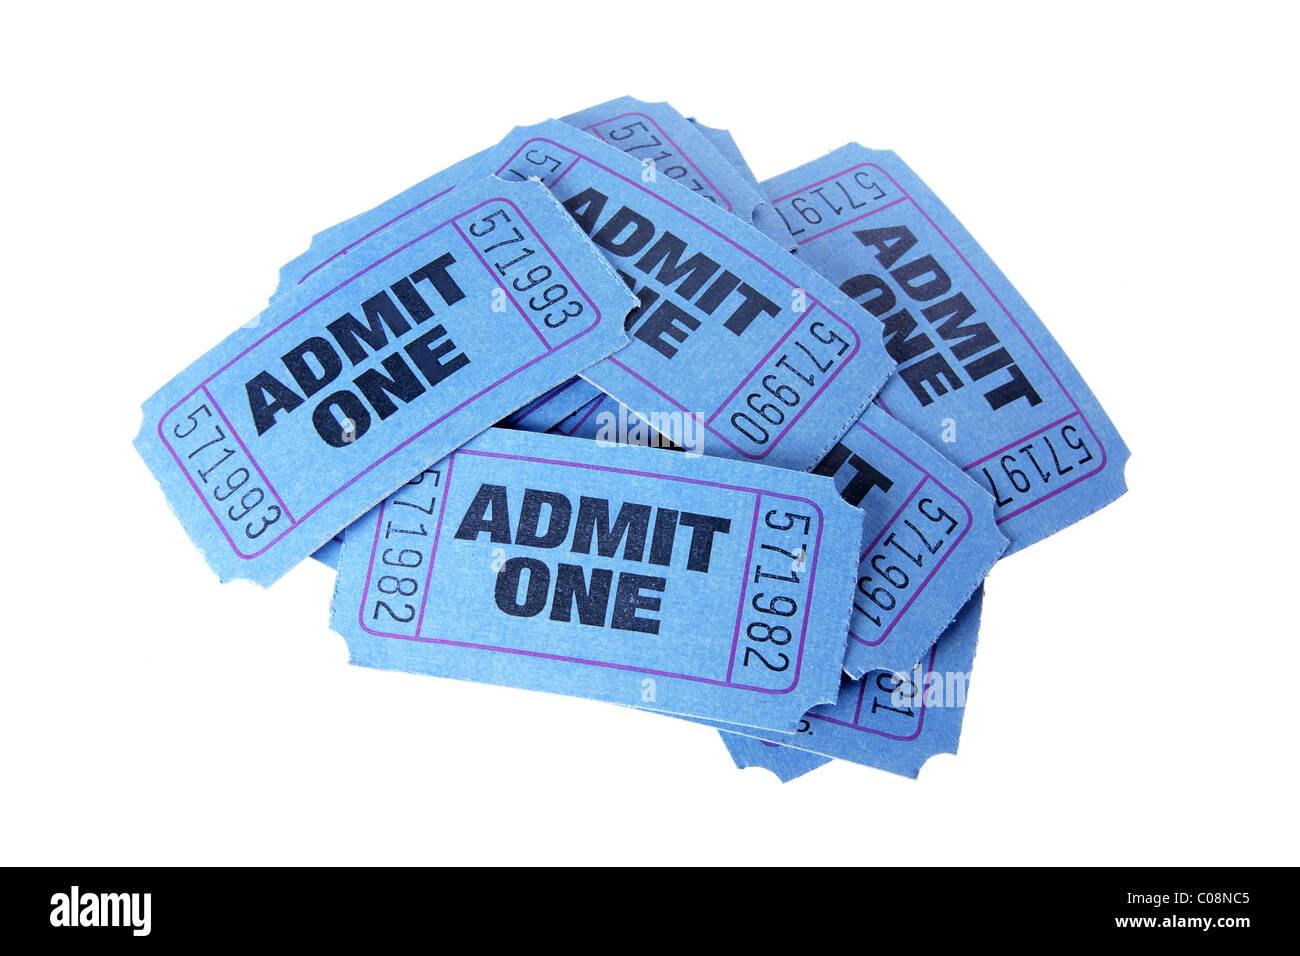 Movie Tickets - Stock Image